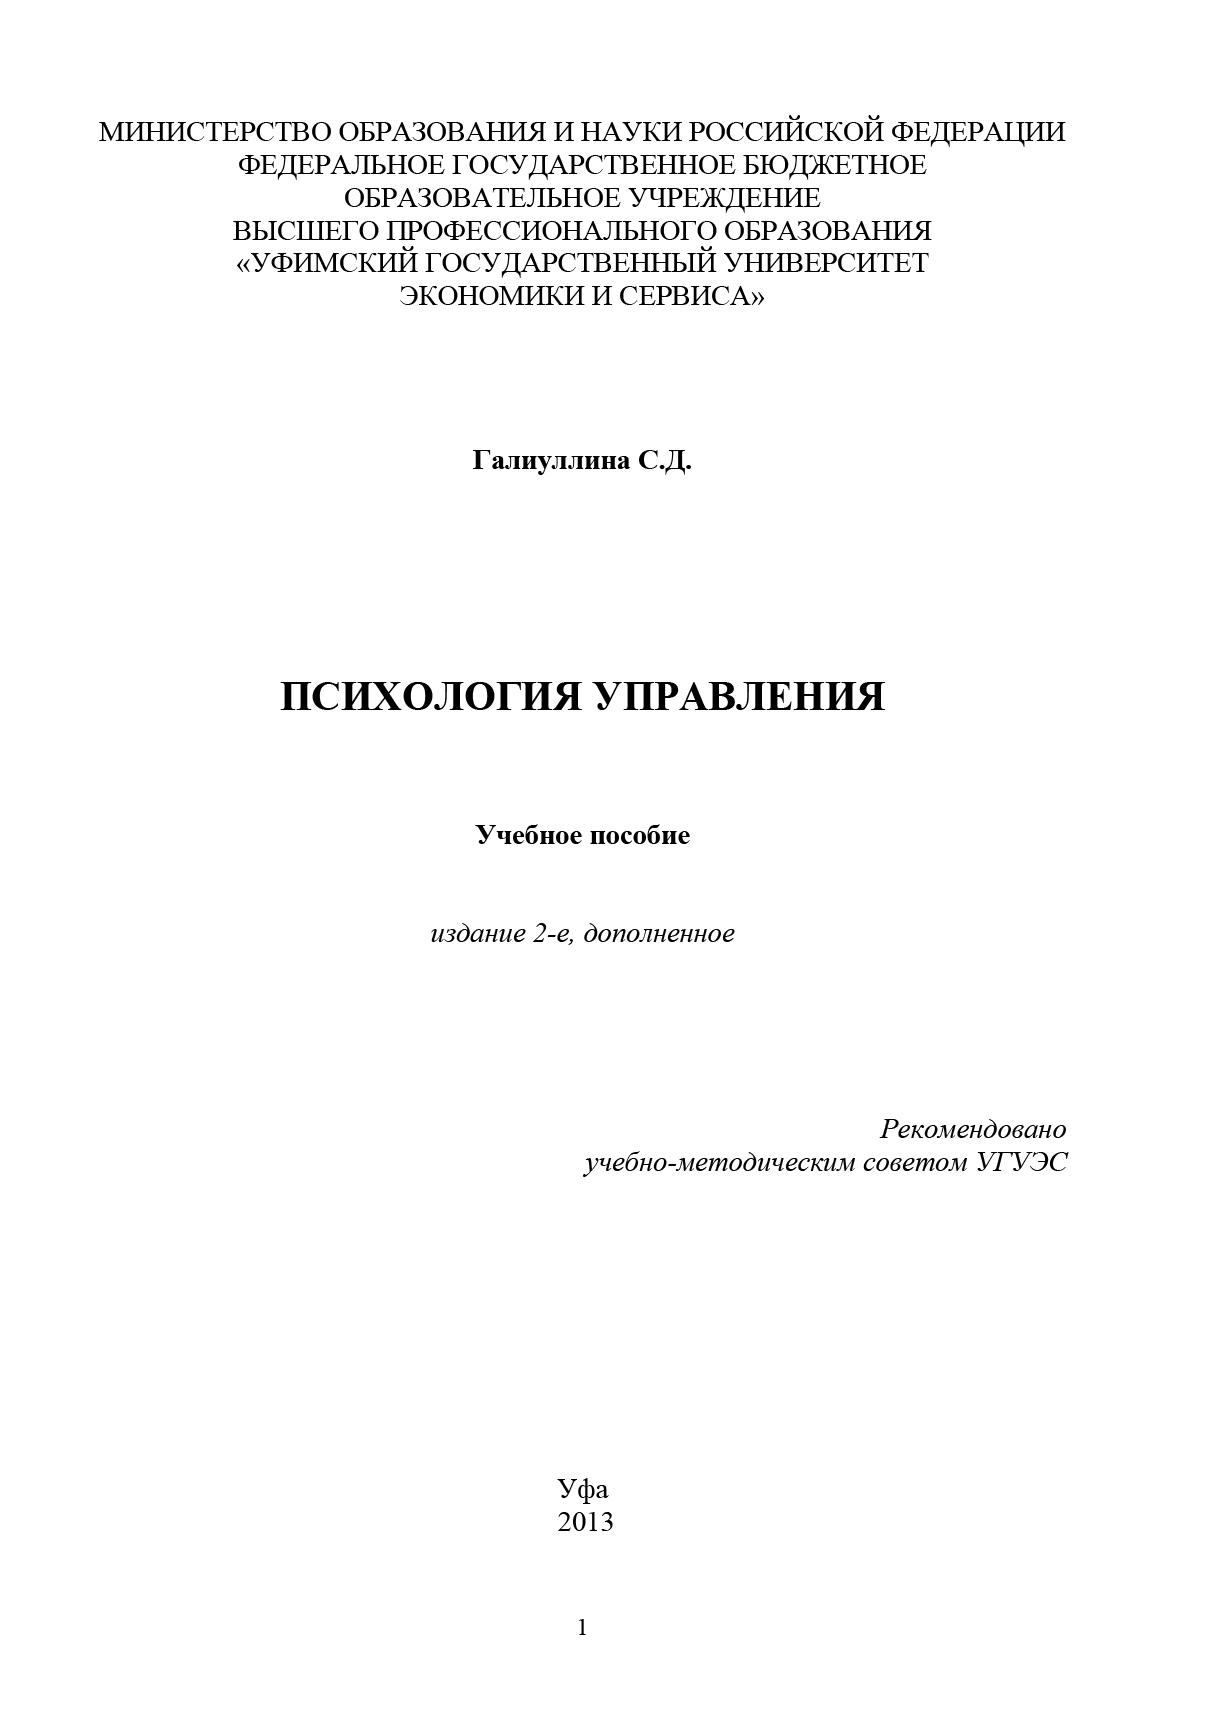 С. Д. Галиуллина Психология управления